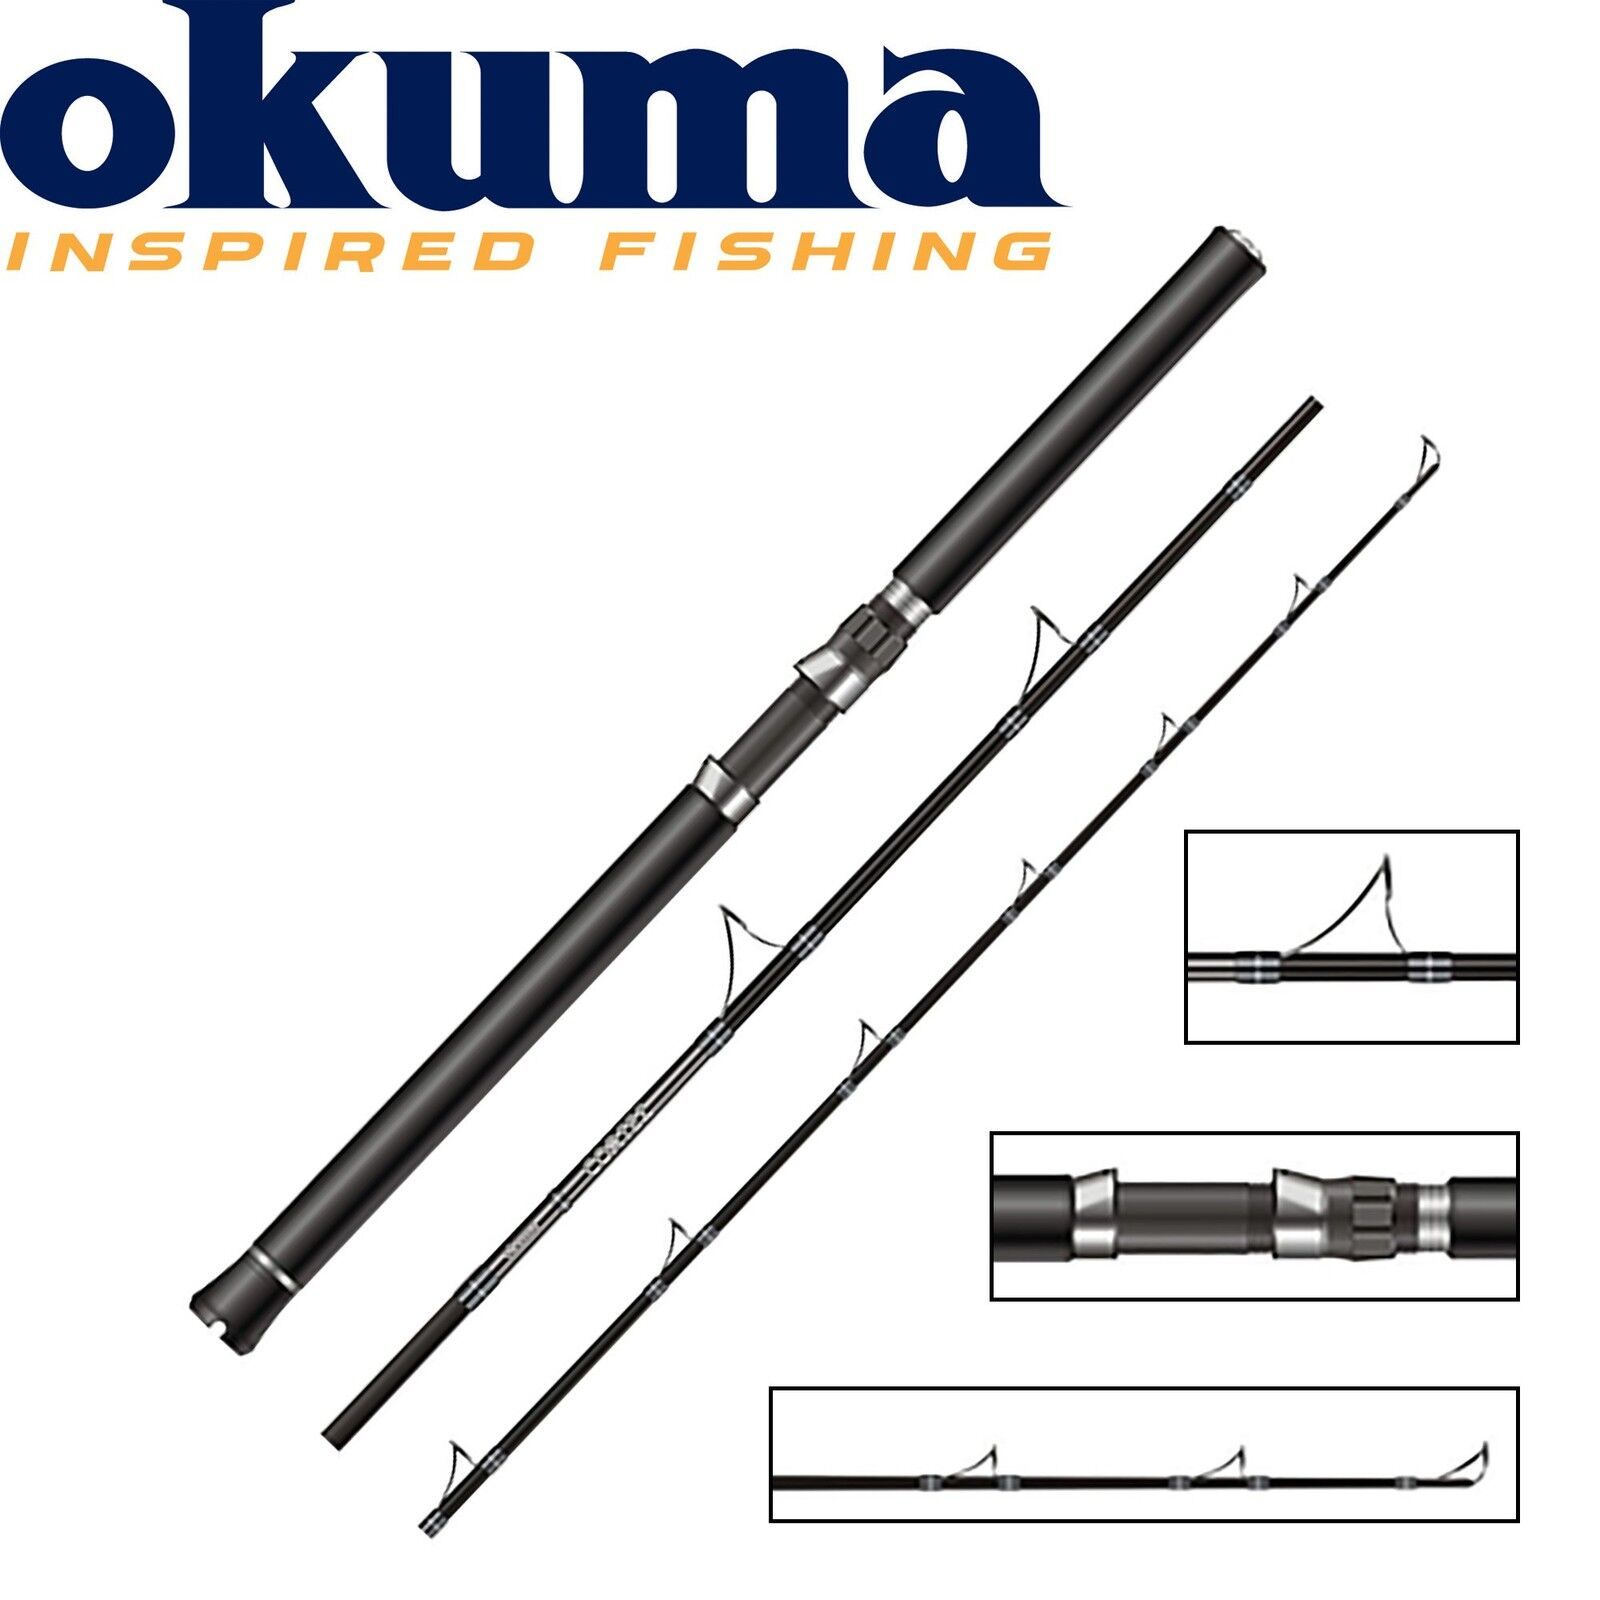 OKUMA Cortez pilkrute 198cm 20-30lbs 20-30lbs 20-30lbs - stivali stadia per Pilk-E NATURA esche A PESCA fa7030